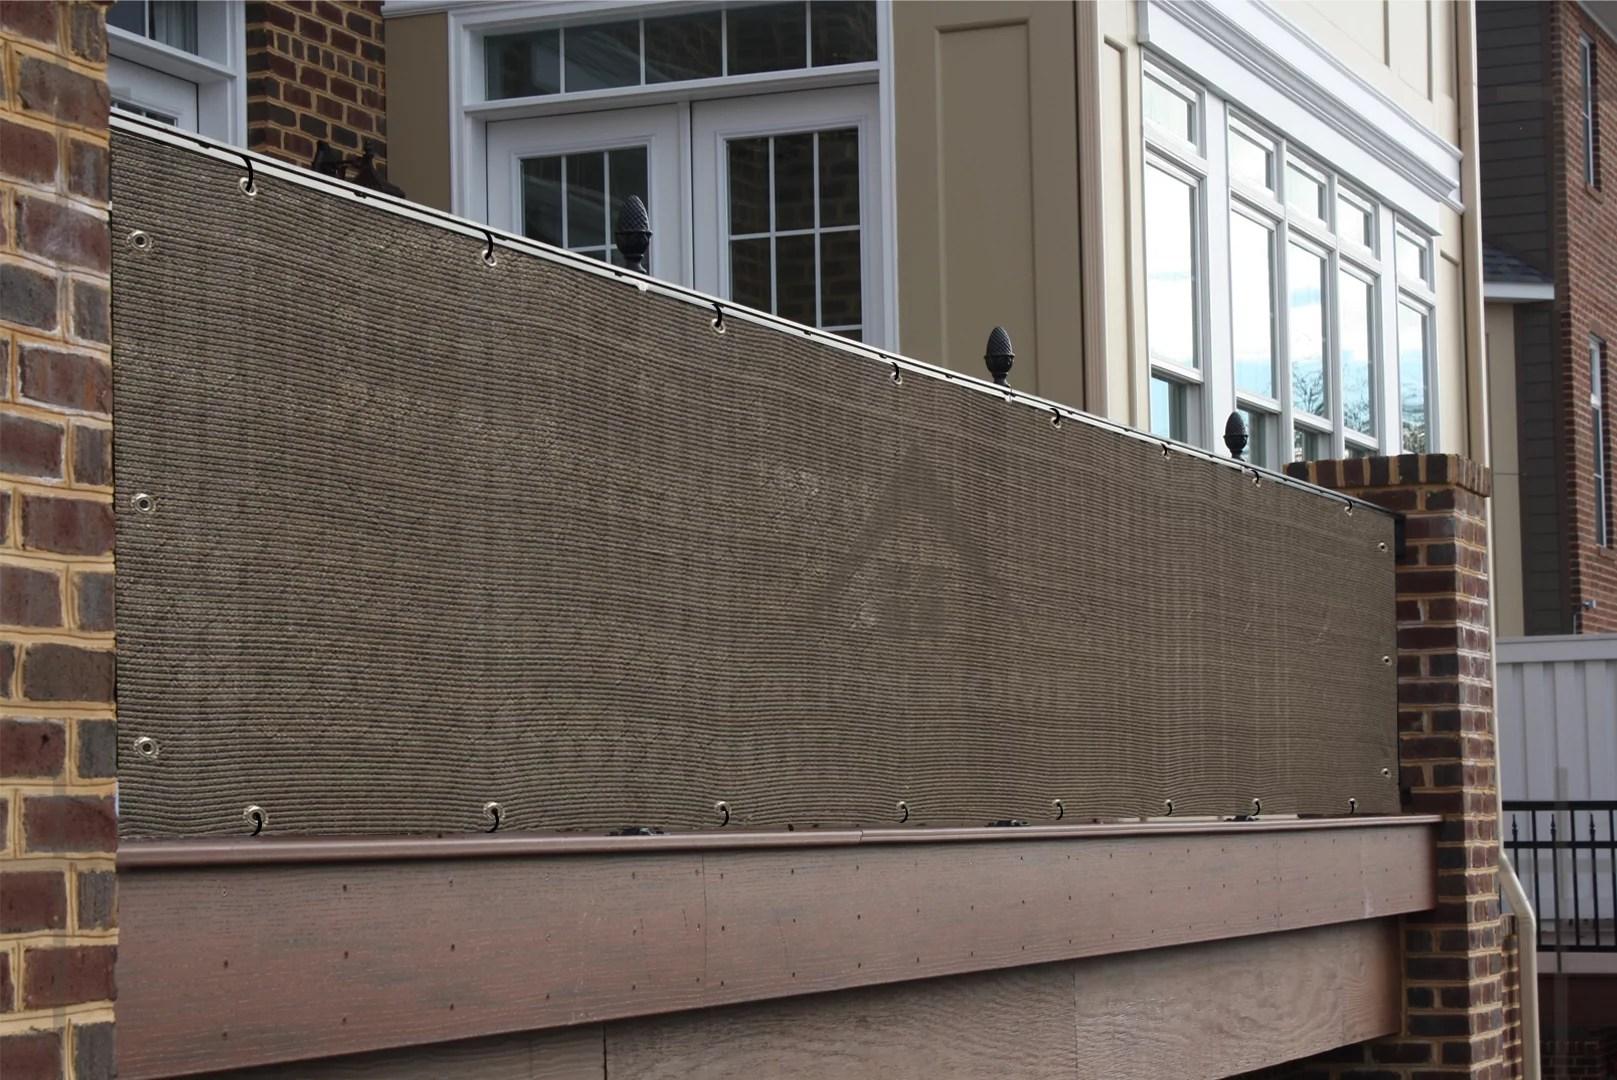 alion home mocha brown elegant privacy screen for backyard deck patio balcony fence pool porch railing 3 x 9